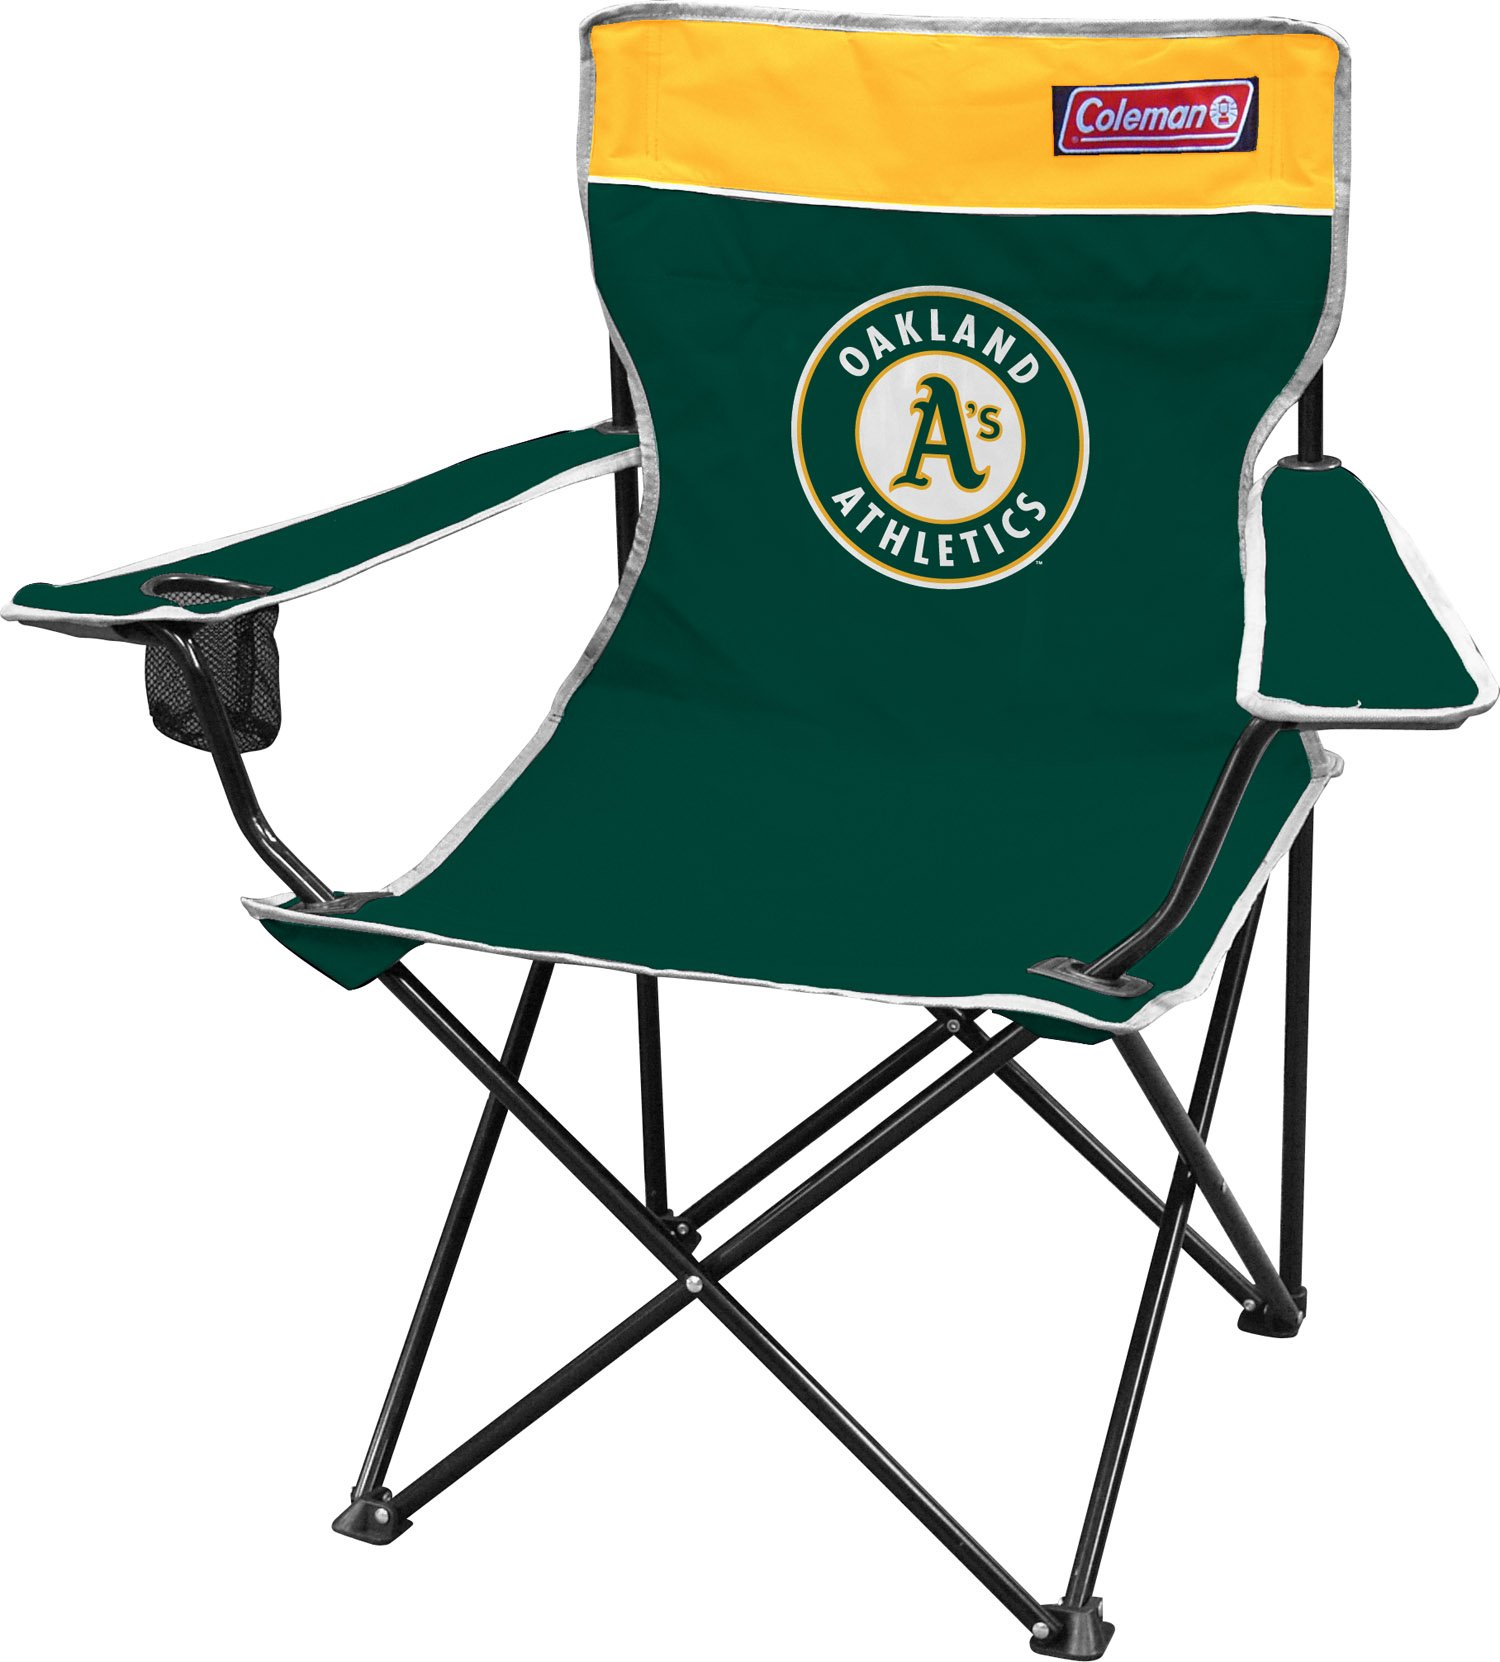 MLB Oakland Athletics Broadband Quad Chair, Large, Green